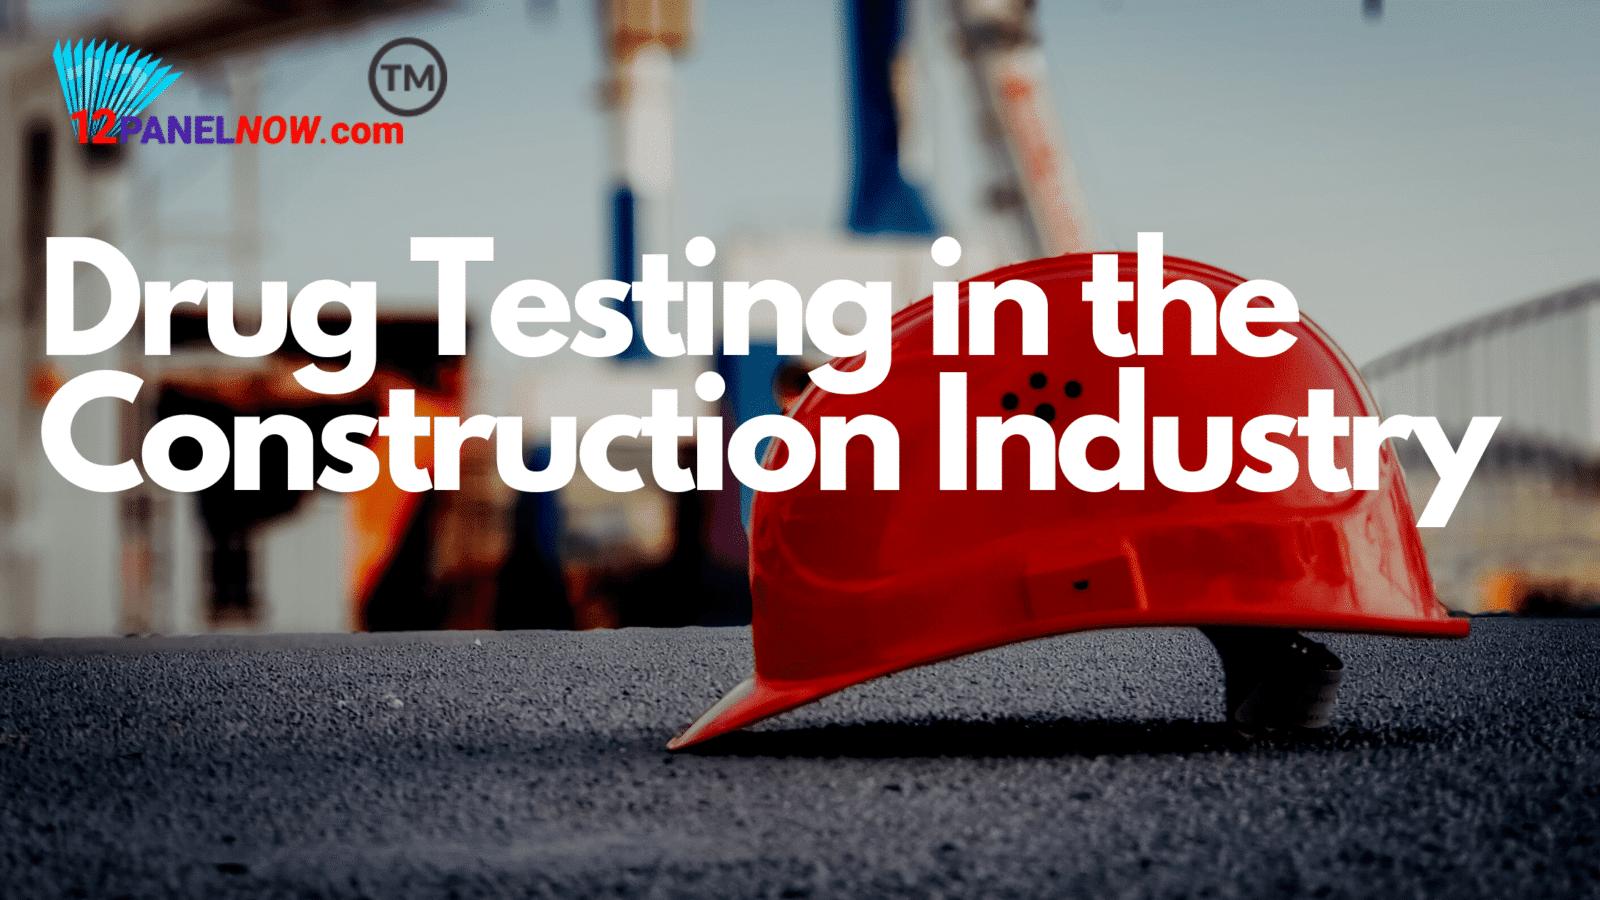 Do Construction Companies Drug Test?